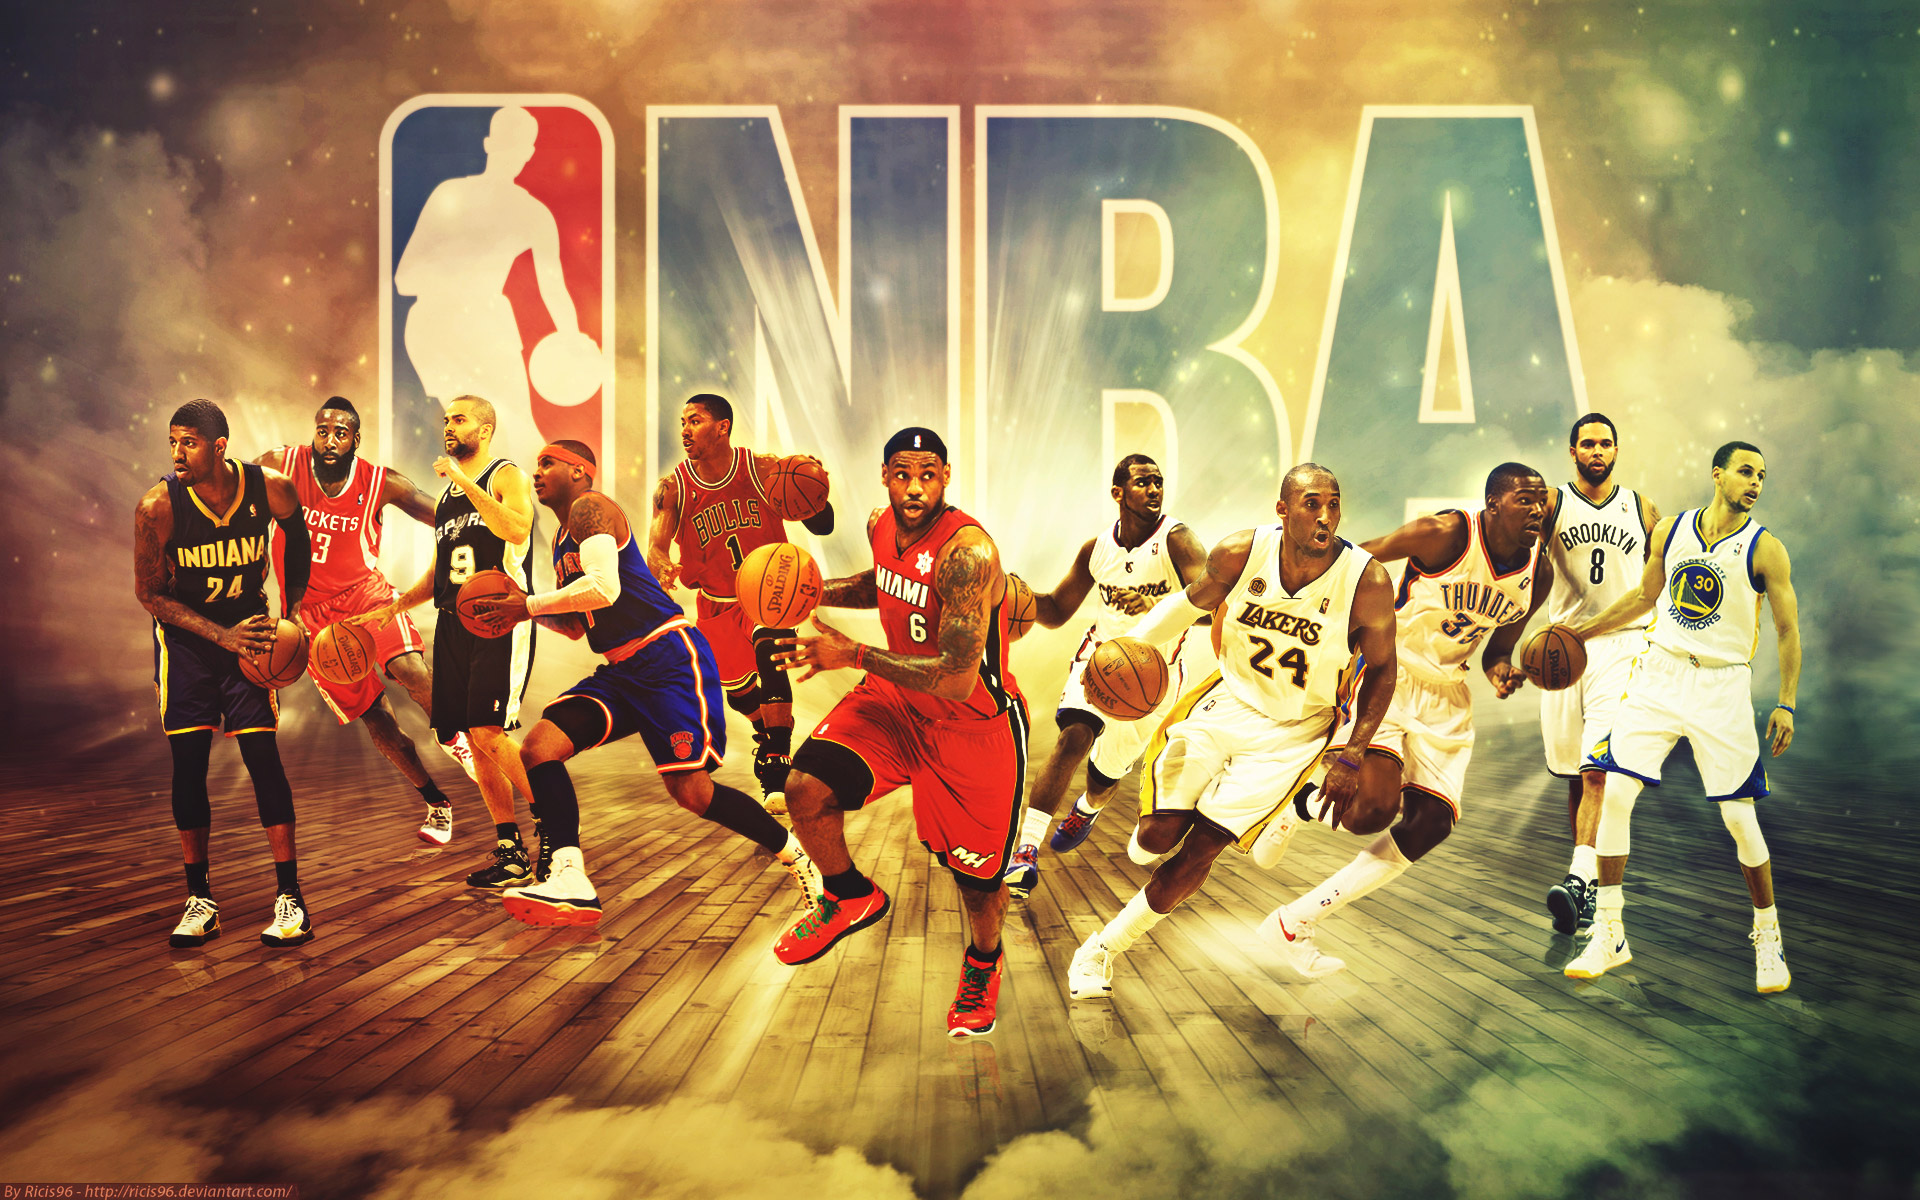 nba stars nba team wallpaper share this cool nba basketball team 1920x1200